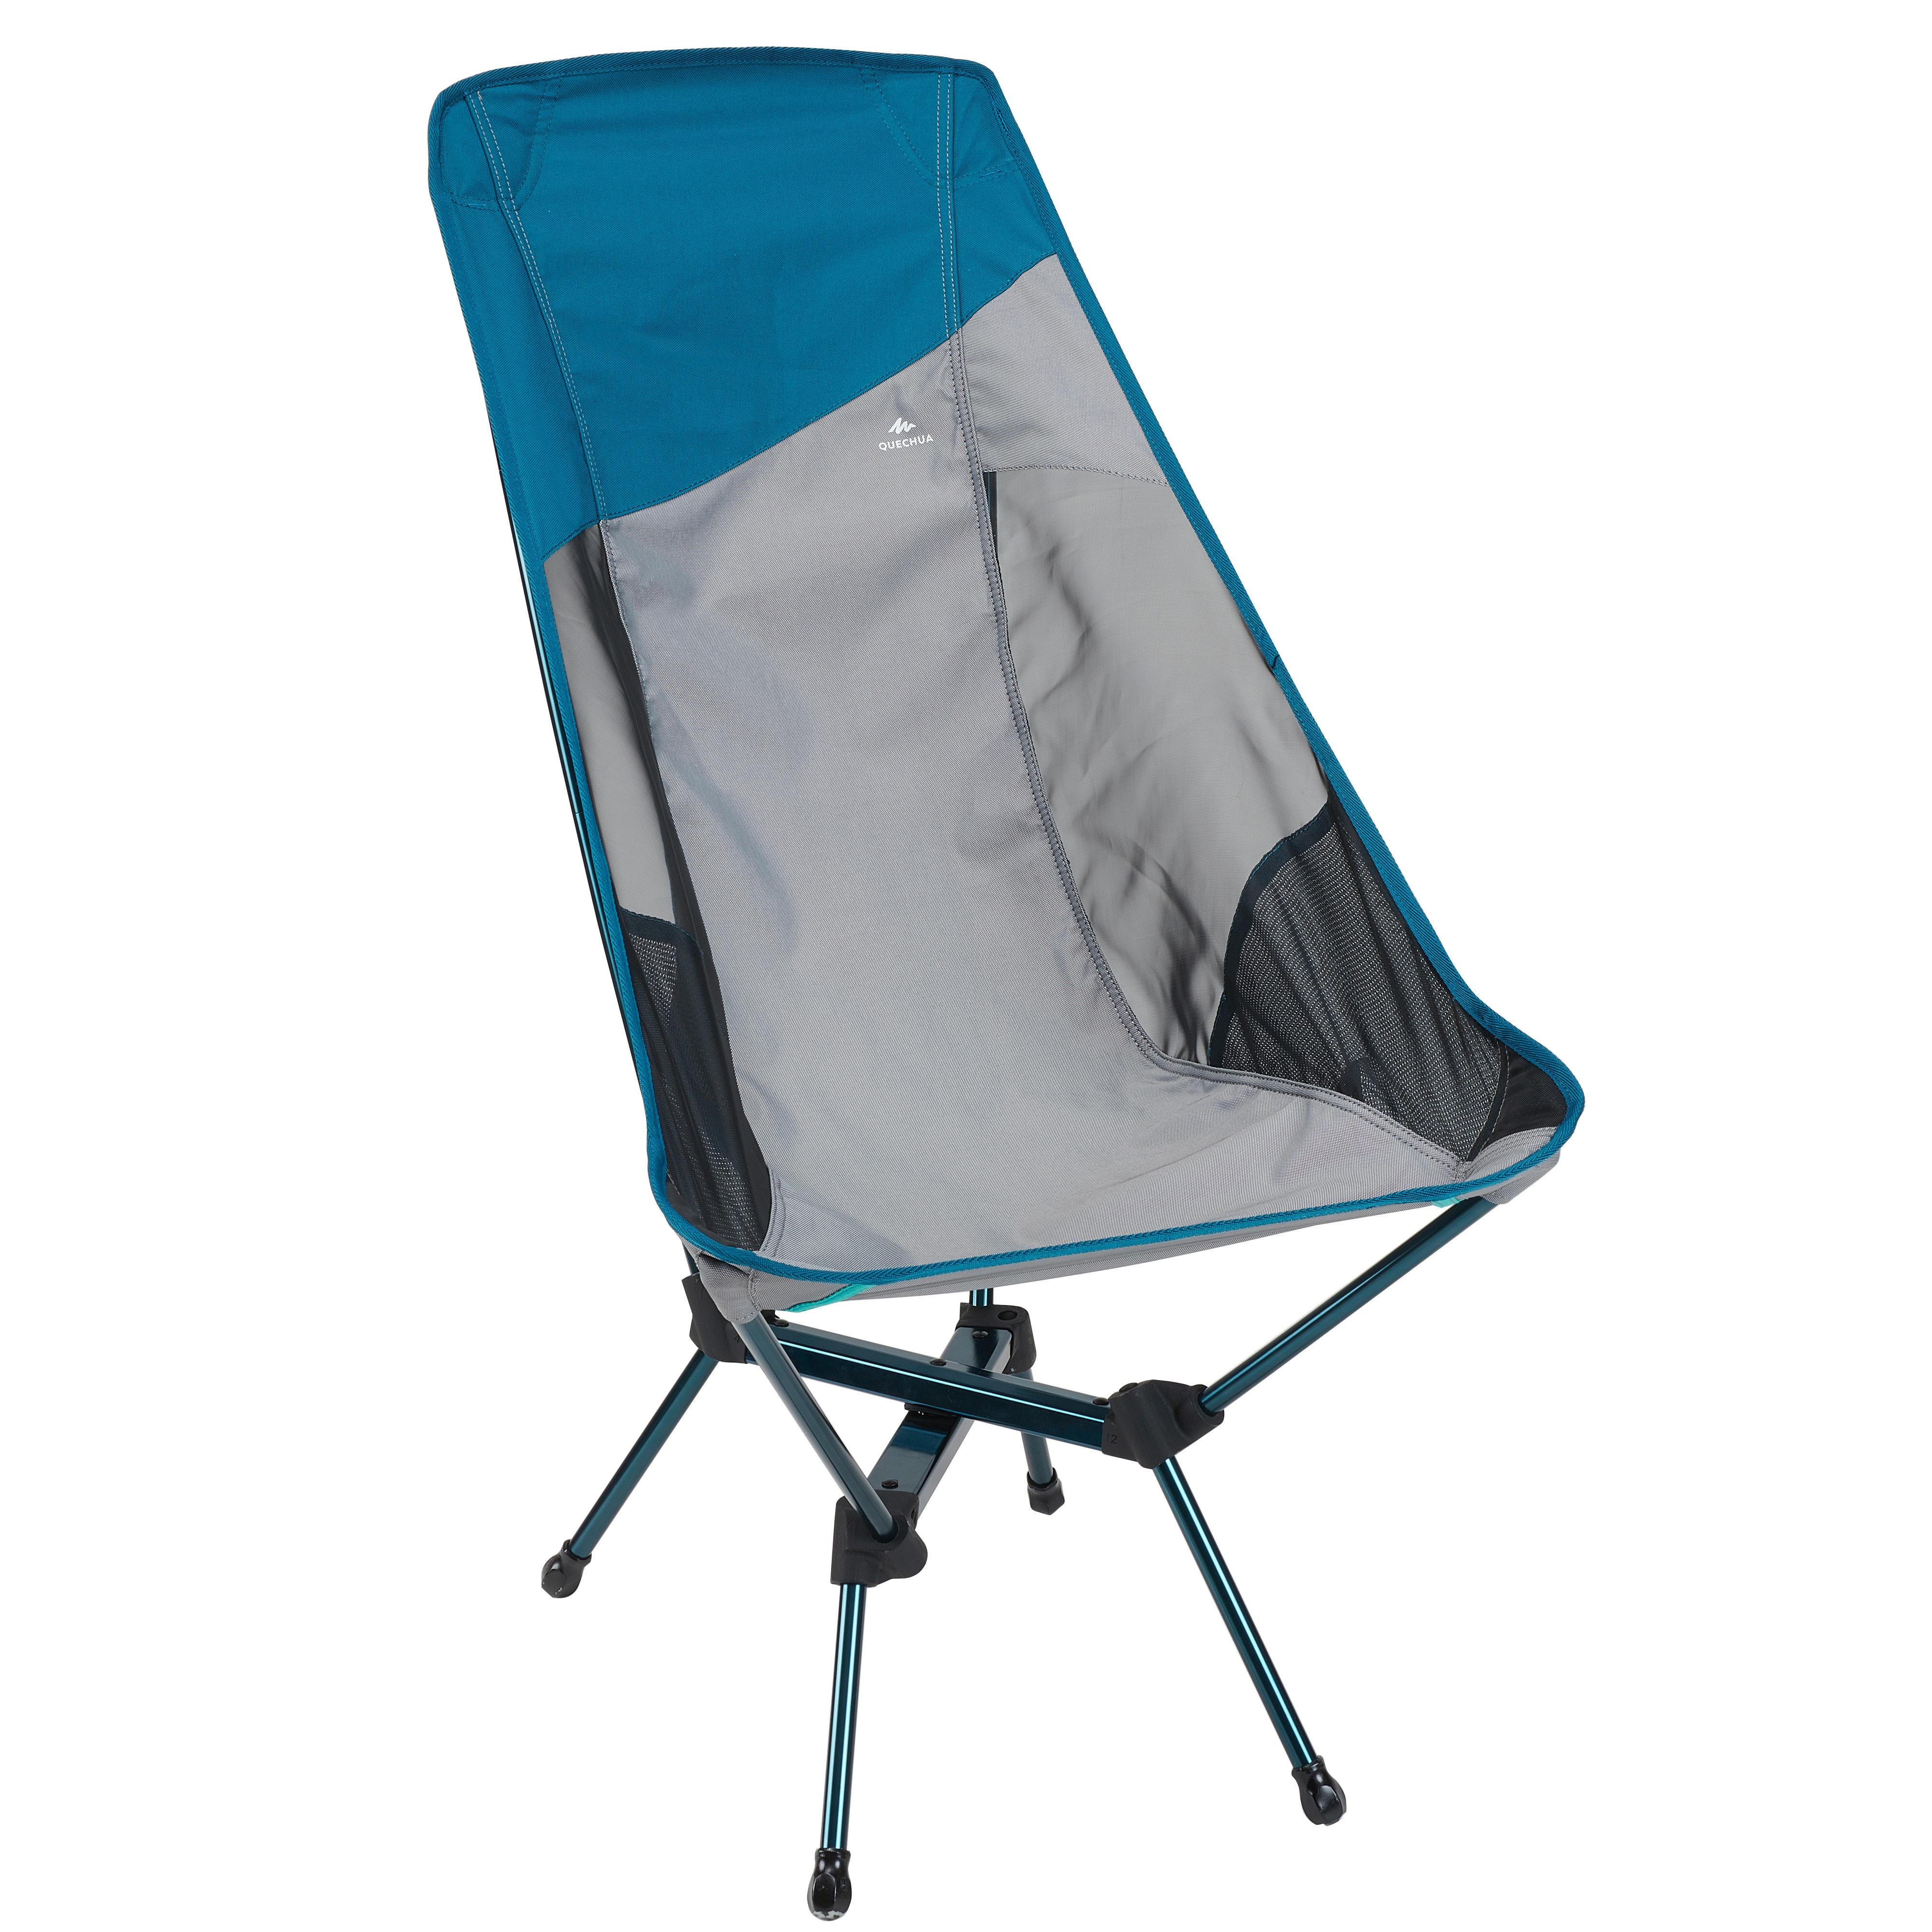 Für dicke campingstühle Campingstuhl mit